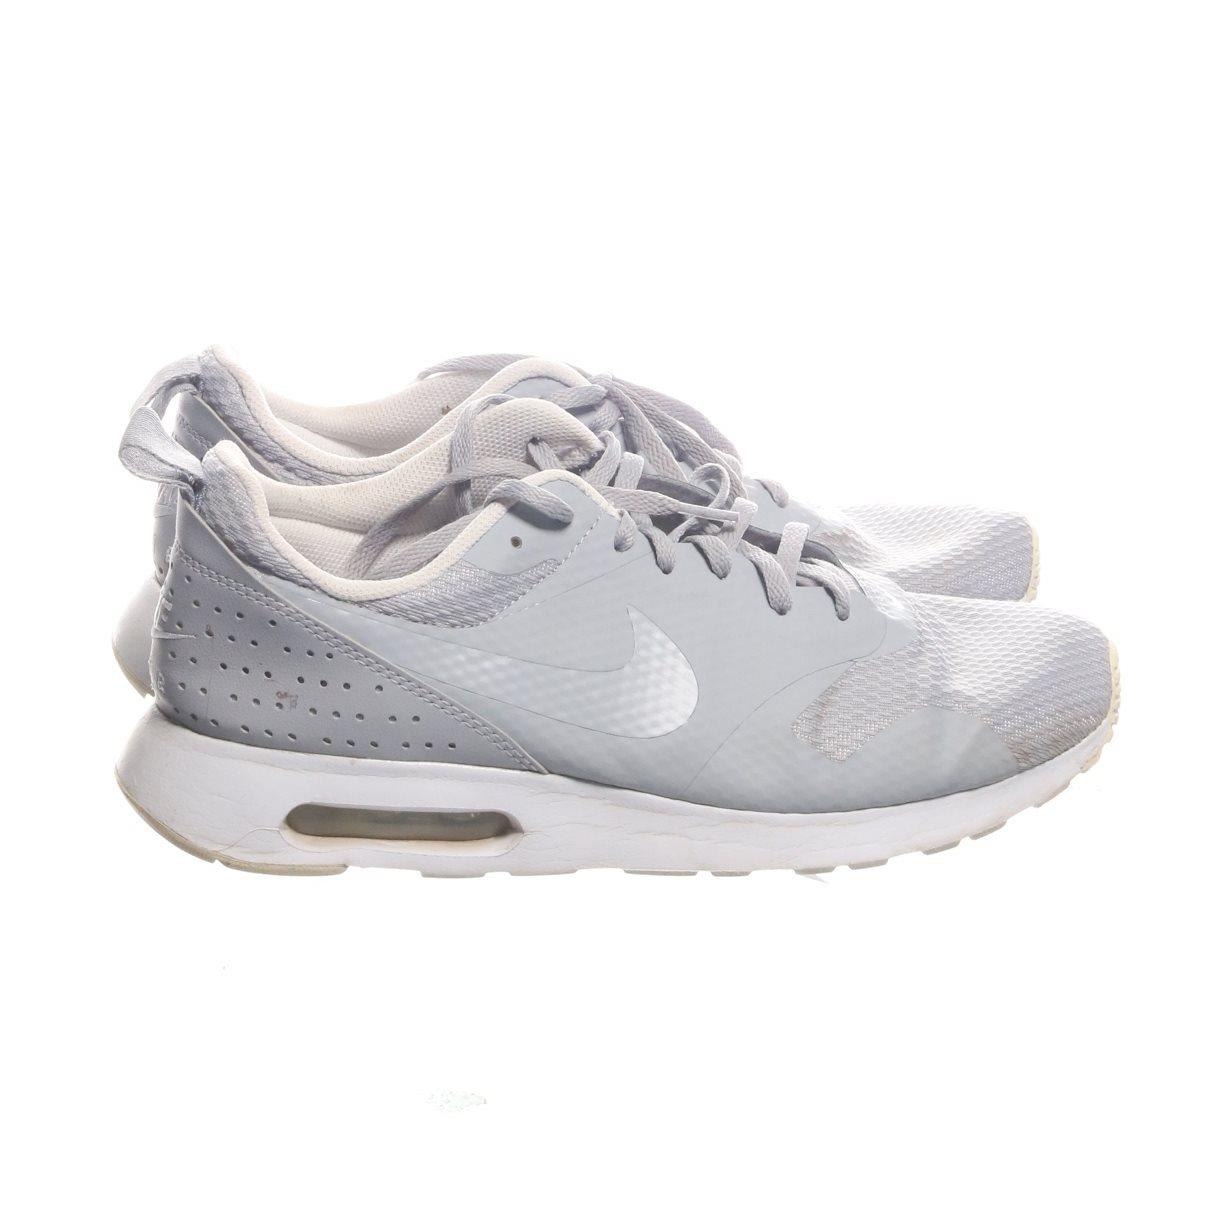 cheap for discount 0f7f4 5051d Nike, Träningsskor, Strl  42,5, Air Max Tavas, Grå